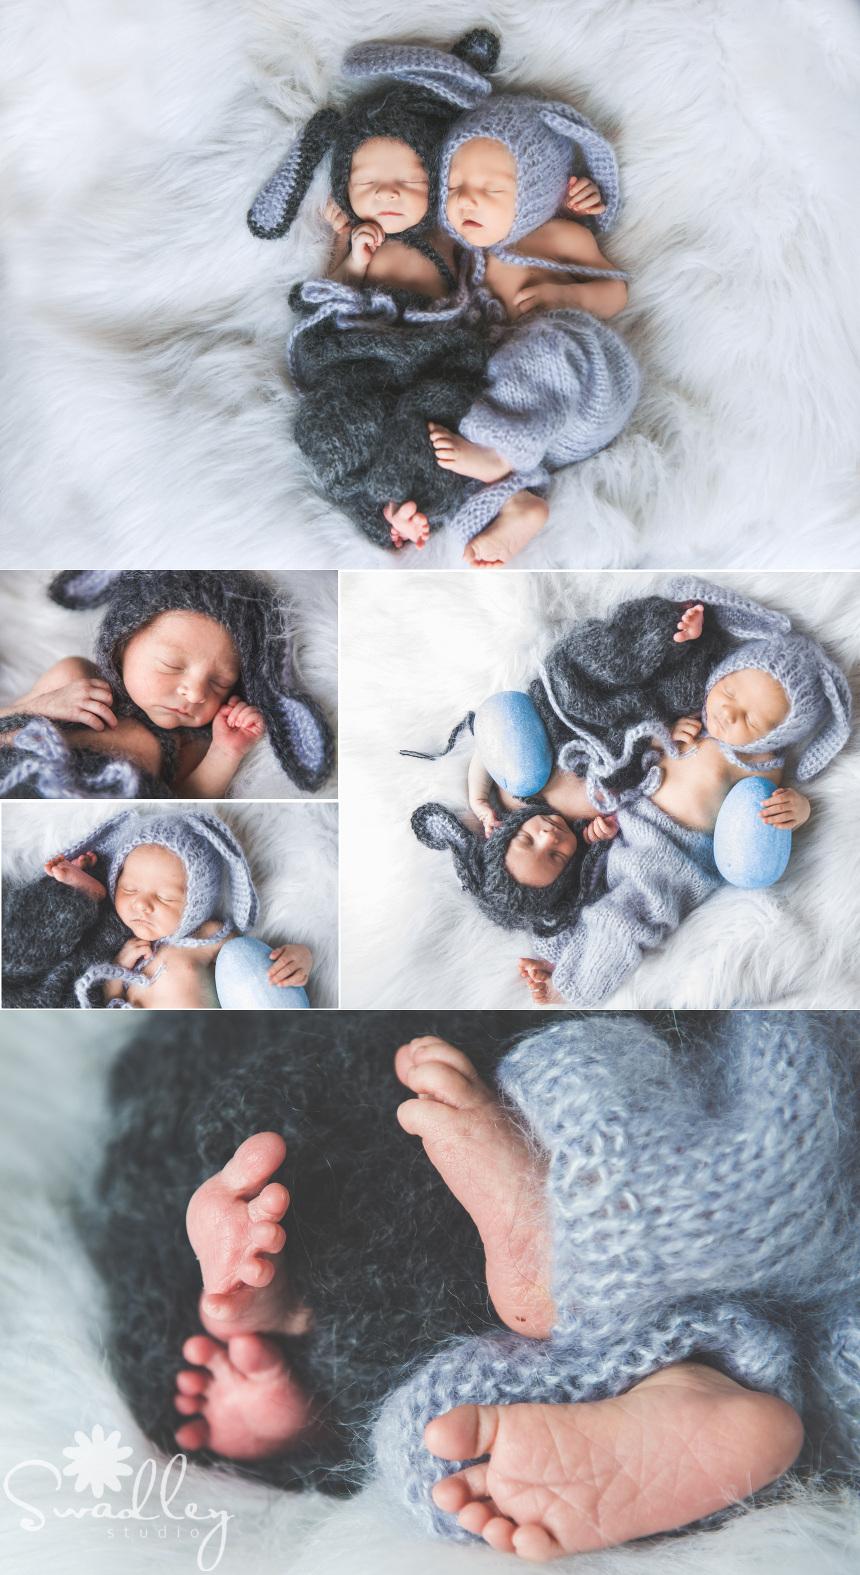 martinsburg newborn photographers twins multiples bunnies easter